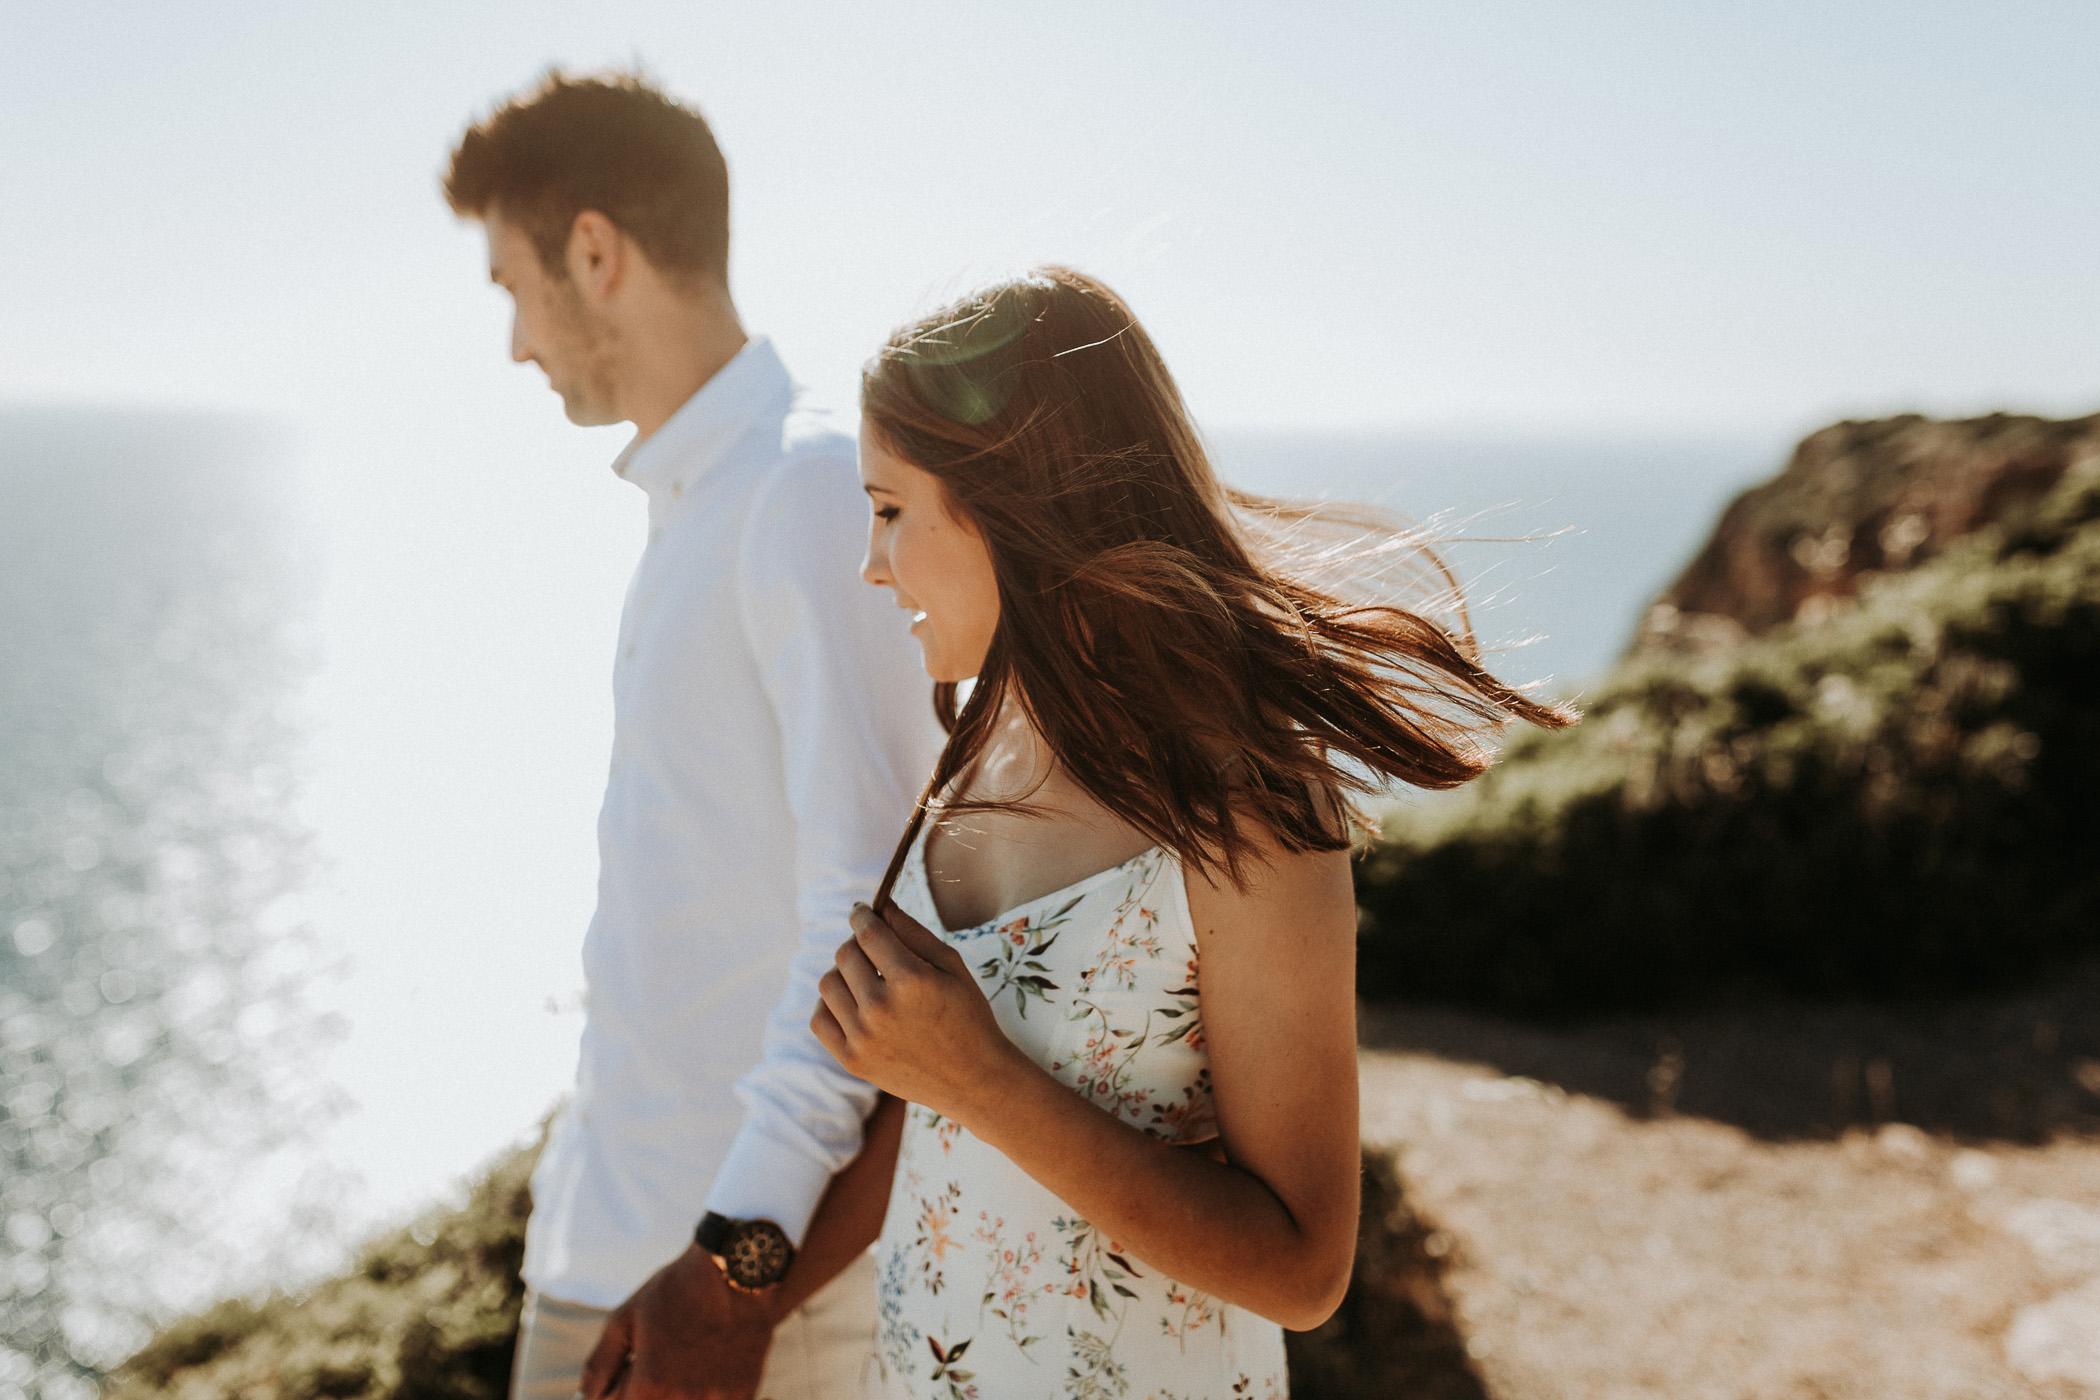 DanielaMarquardtPhotography_wedding_elopement_mallorca_spain_calapi_palma_lauraandtoni_14